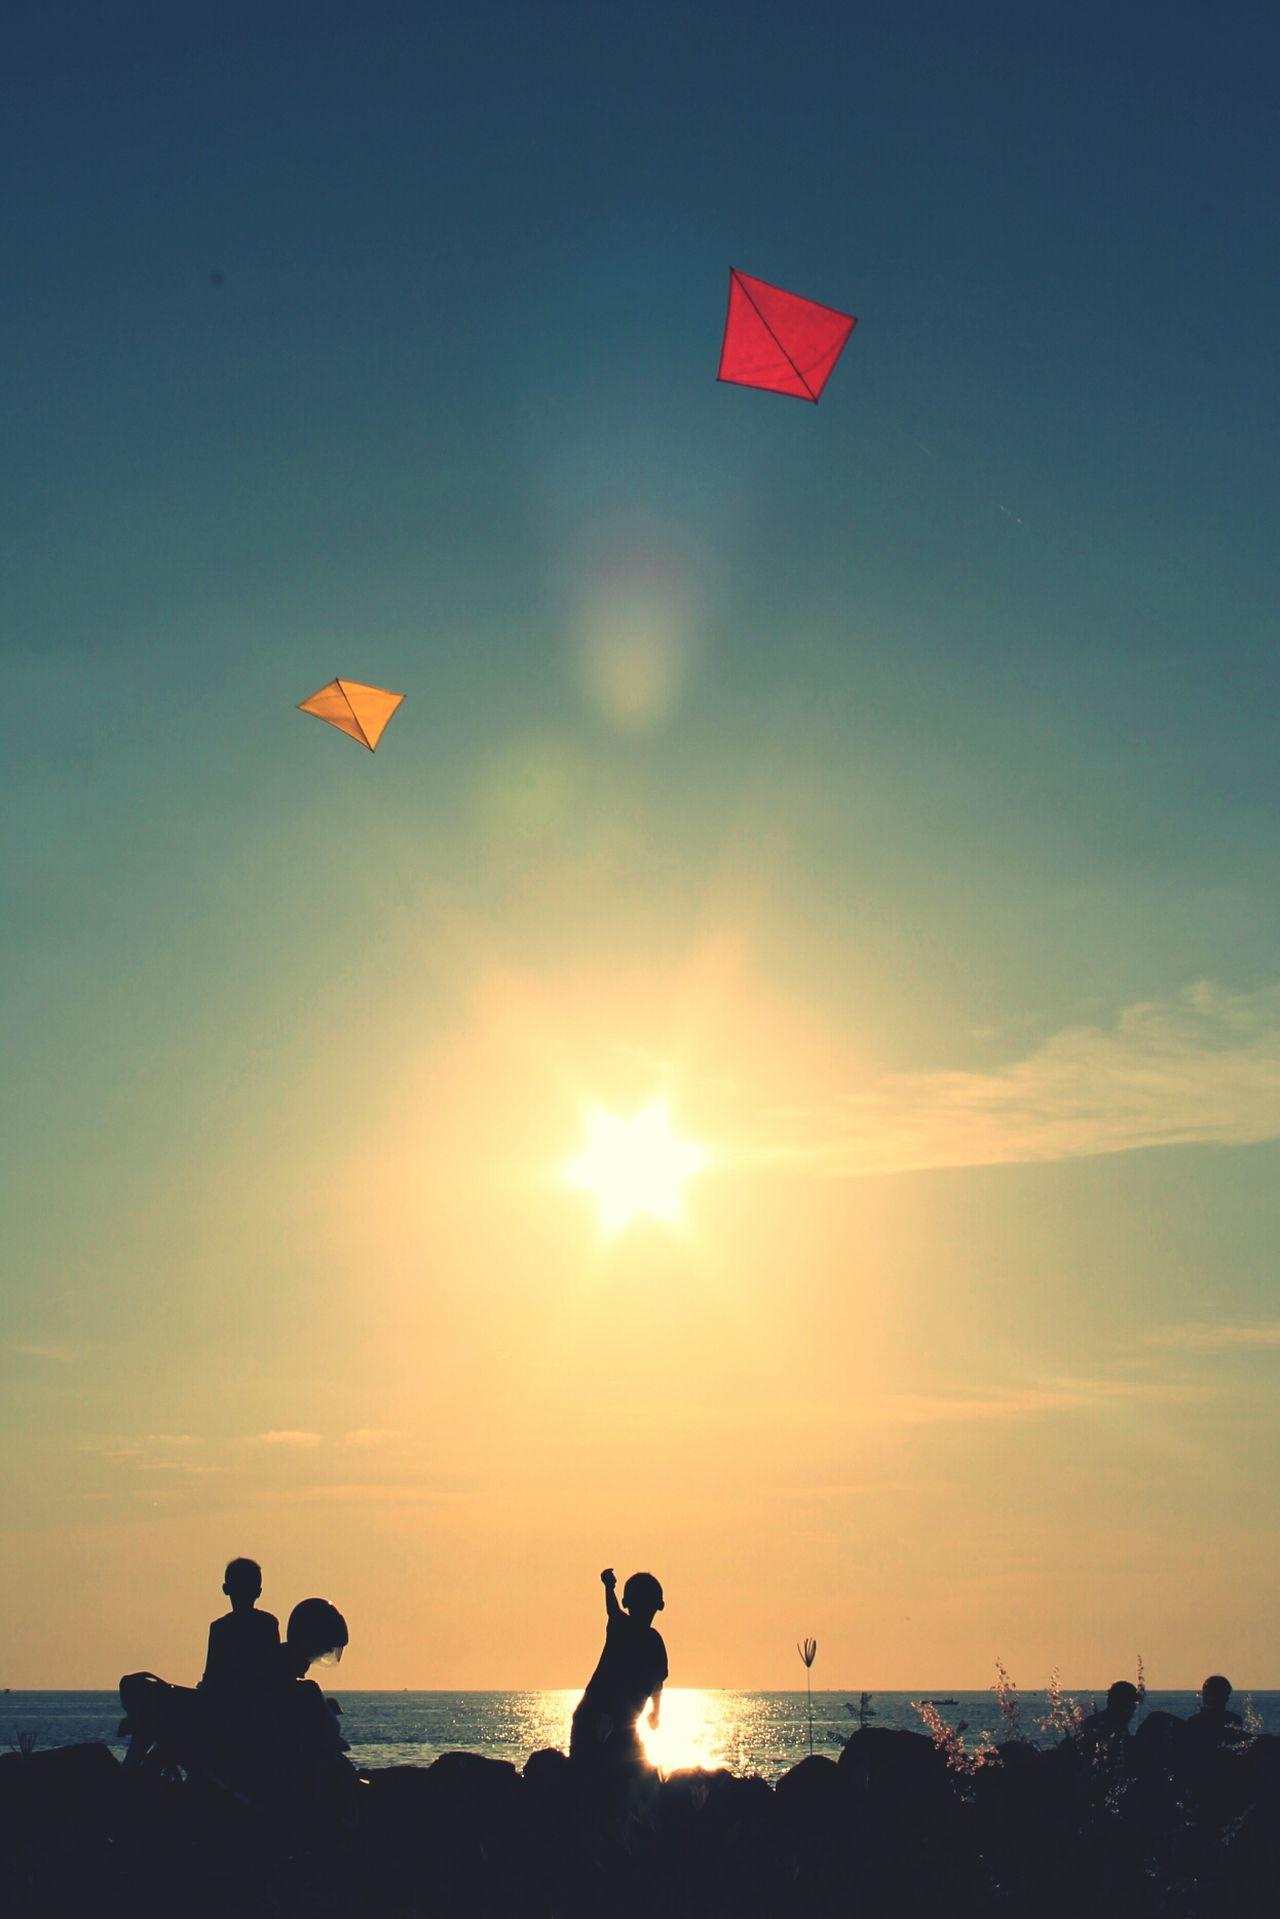 Bermain layang-layang. EyeEm Manado Sunset SilhouettesWeatherPro: Your Perfect Weather Shot